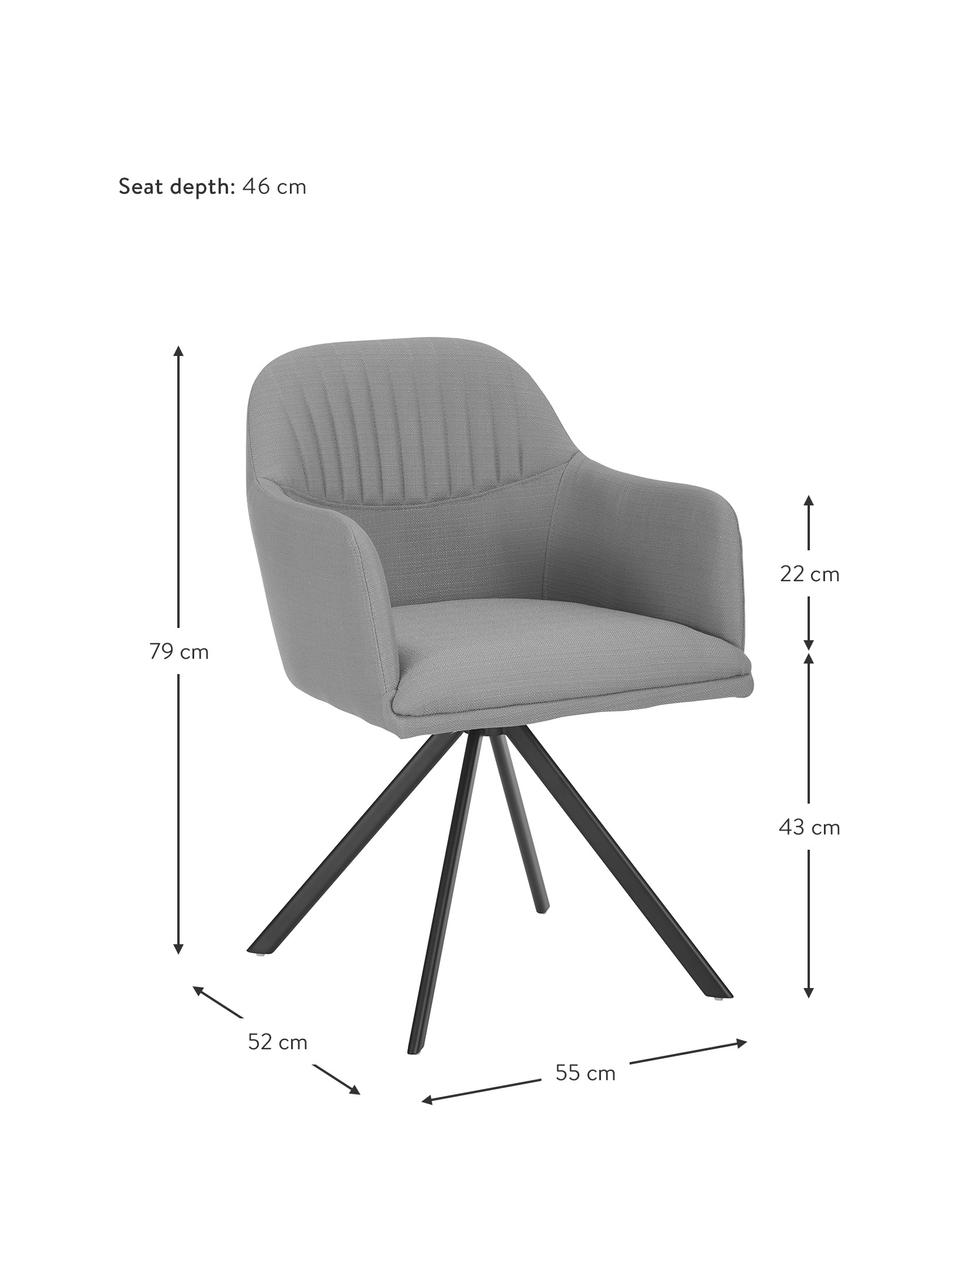 Polster-Drehstuhl Lola mit Armlehne in Grau, Bezug: Polyester, Webstoff Grau, Beine Schwarz, B 55 x T 52 cm